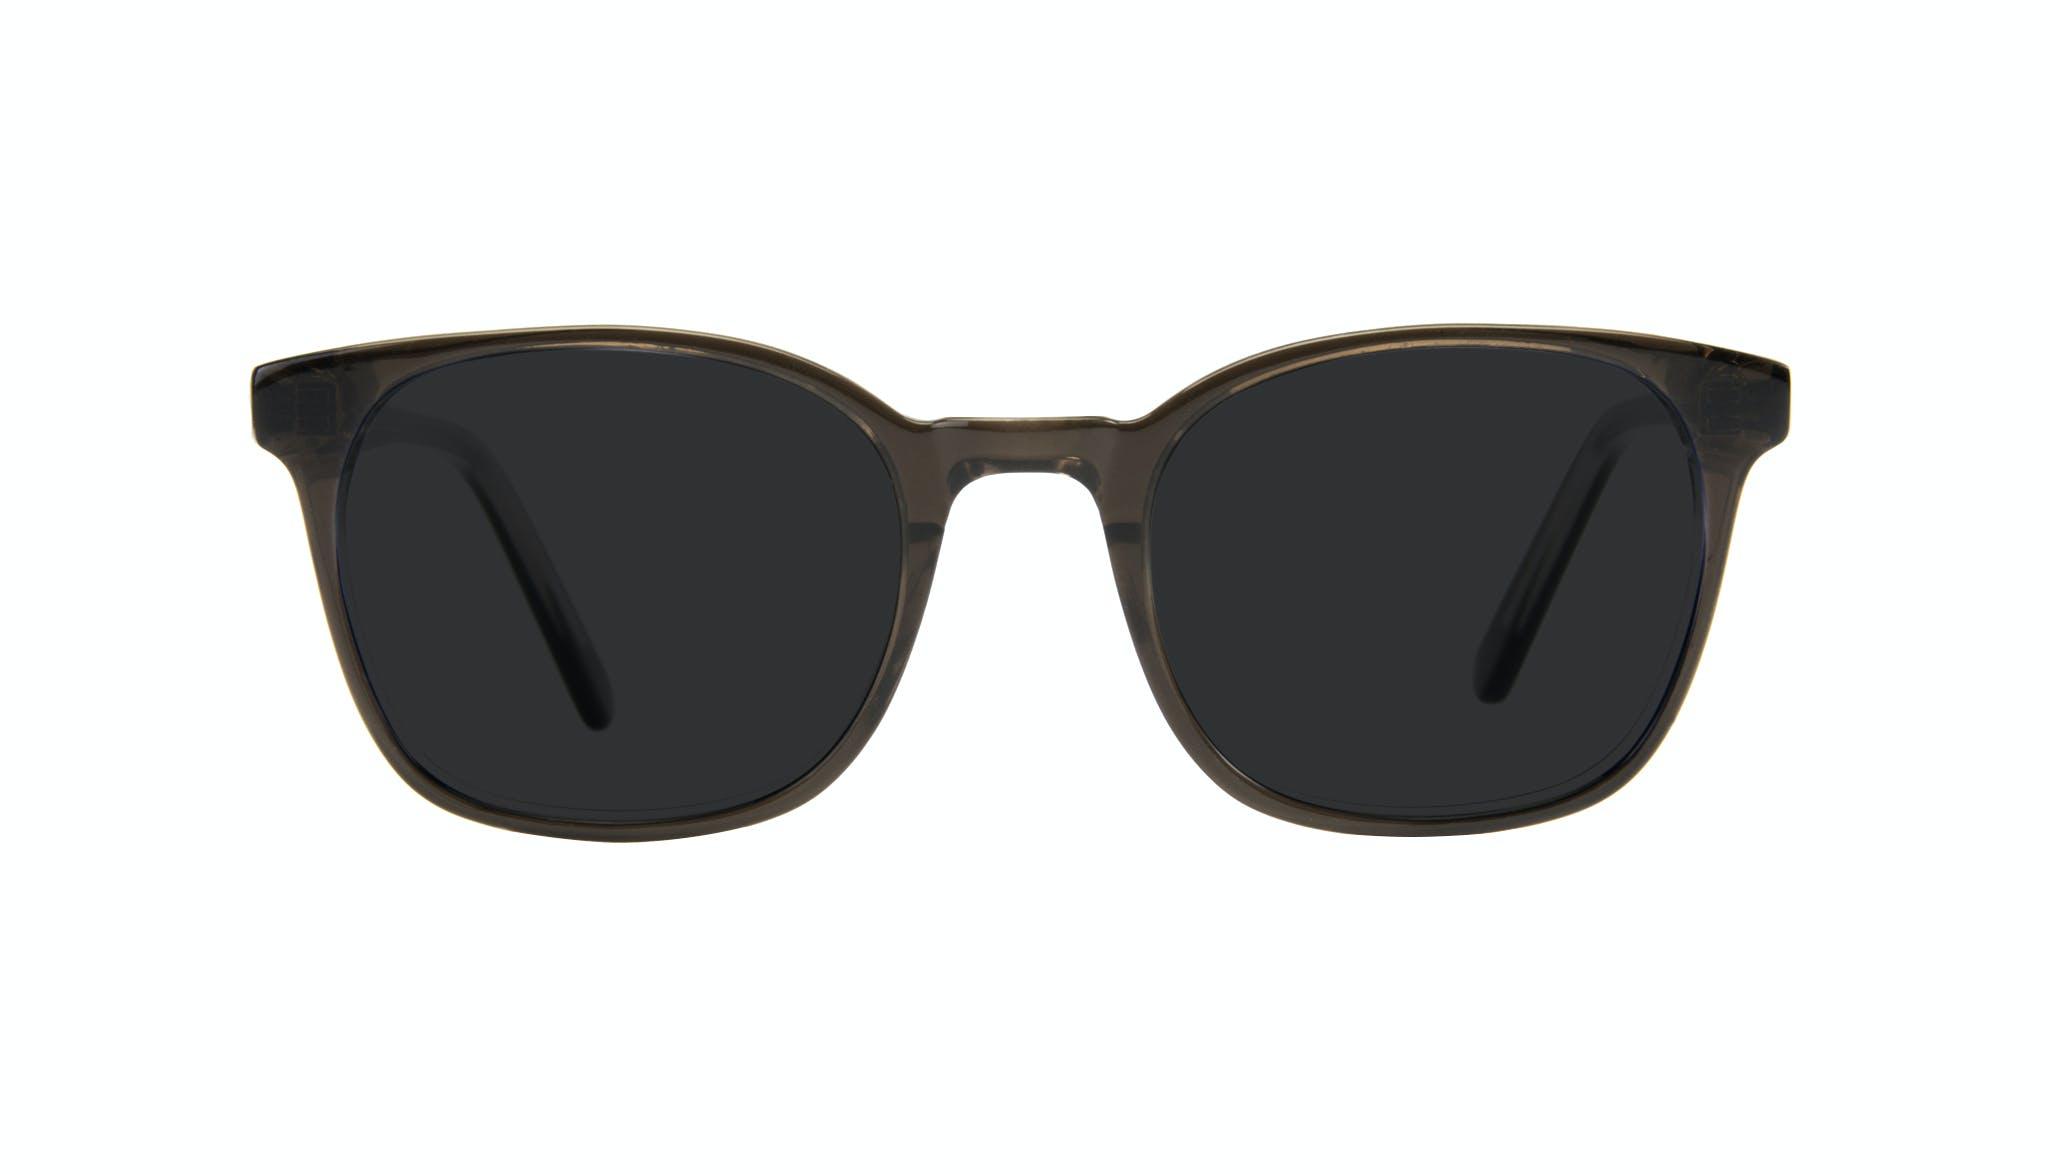 Affordable Fashion Glasses Rectangle Square Sunglasses Men Peak Black Ice Front